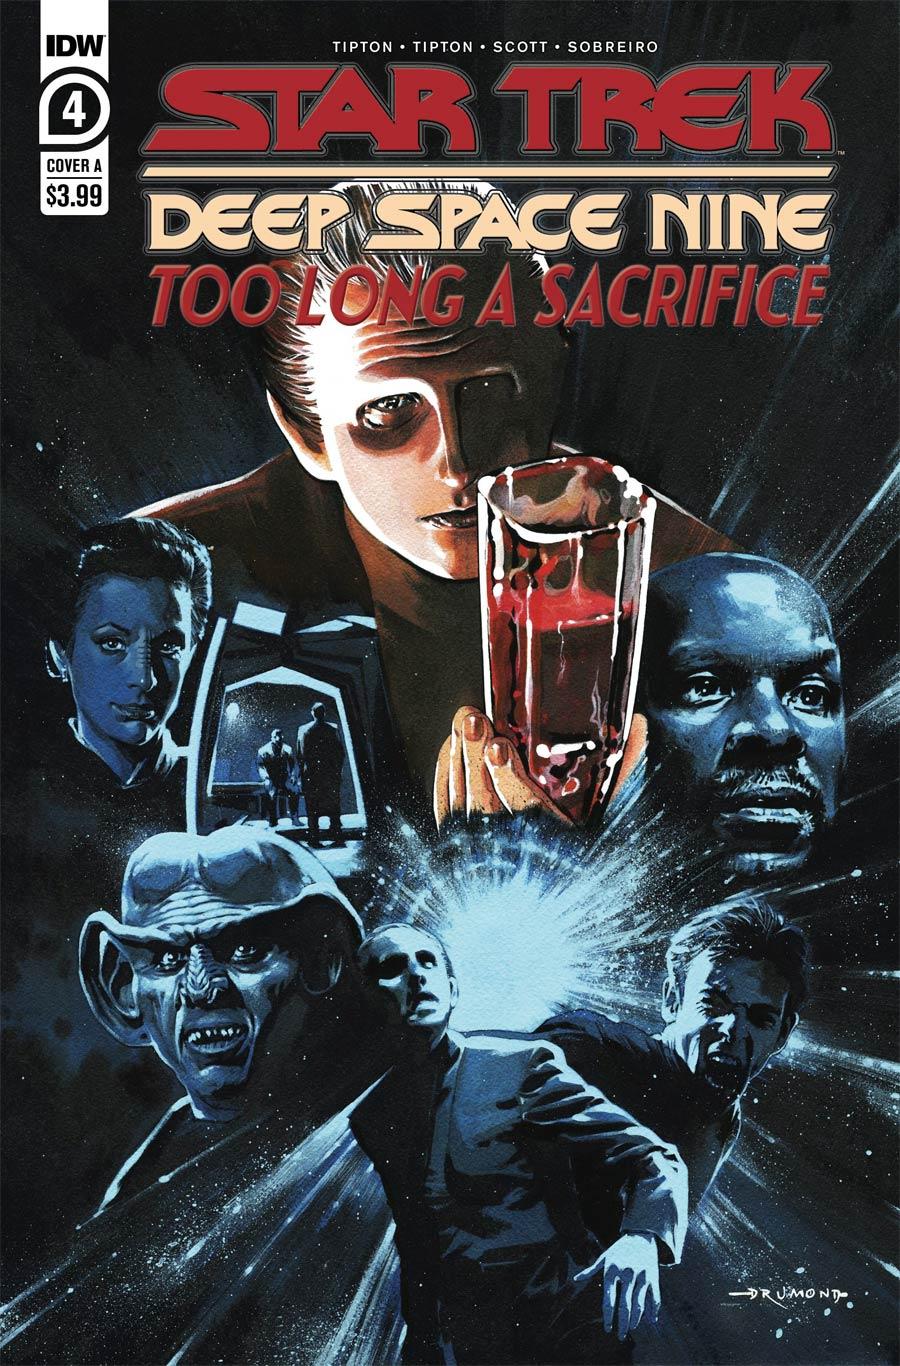 Star Trek Deep Space Nine Too Long A Sacrifice #4 Cover A Regular Ricardo Drumond Cover